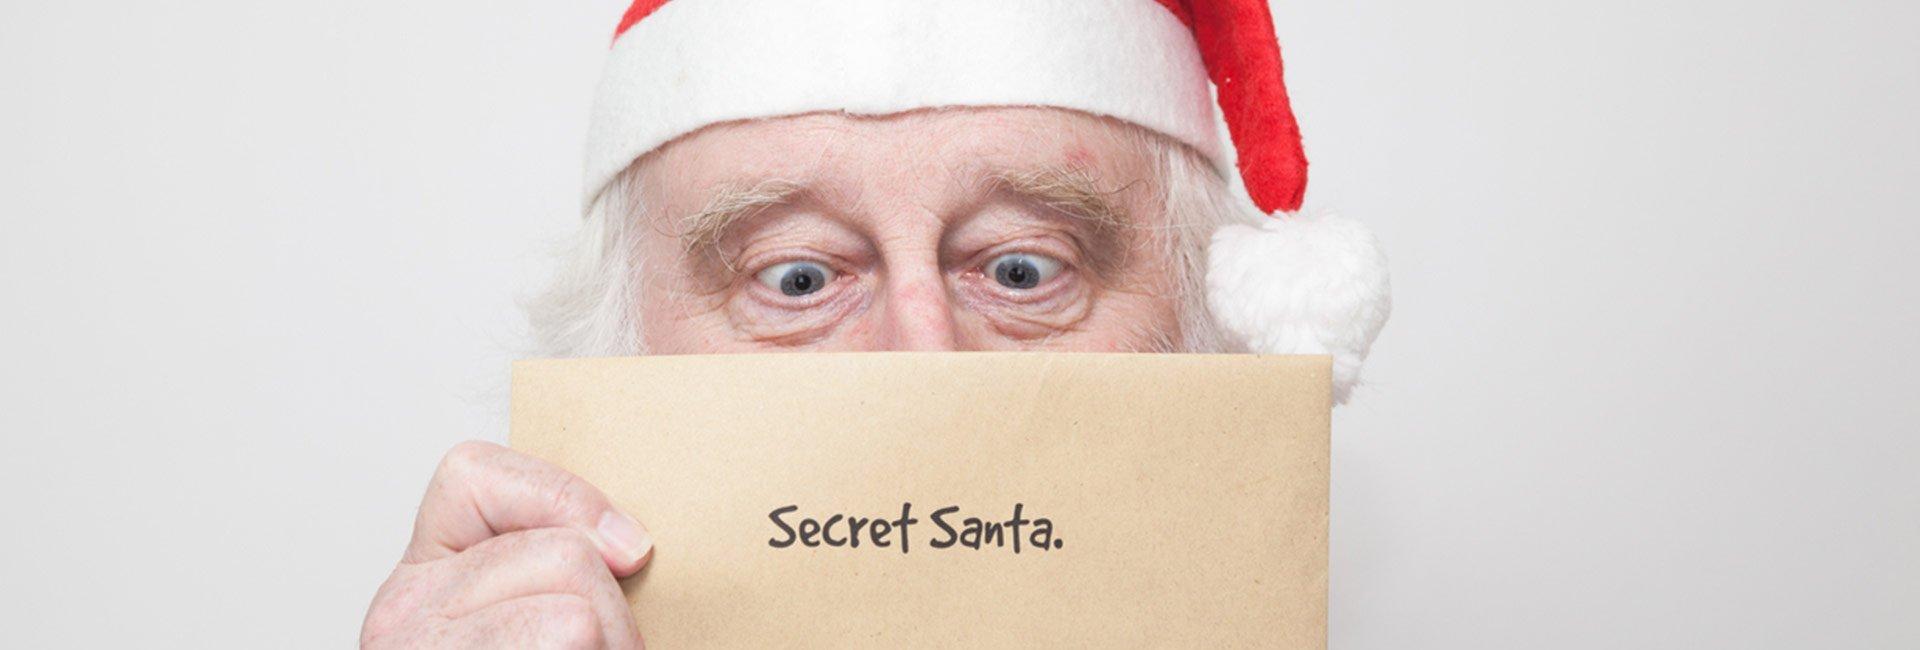 top 5 office ideas for secret santa